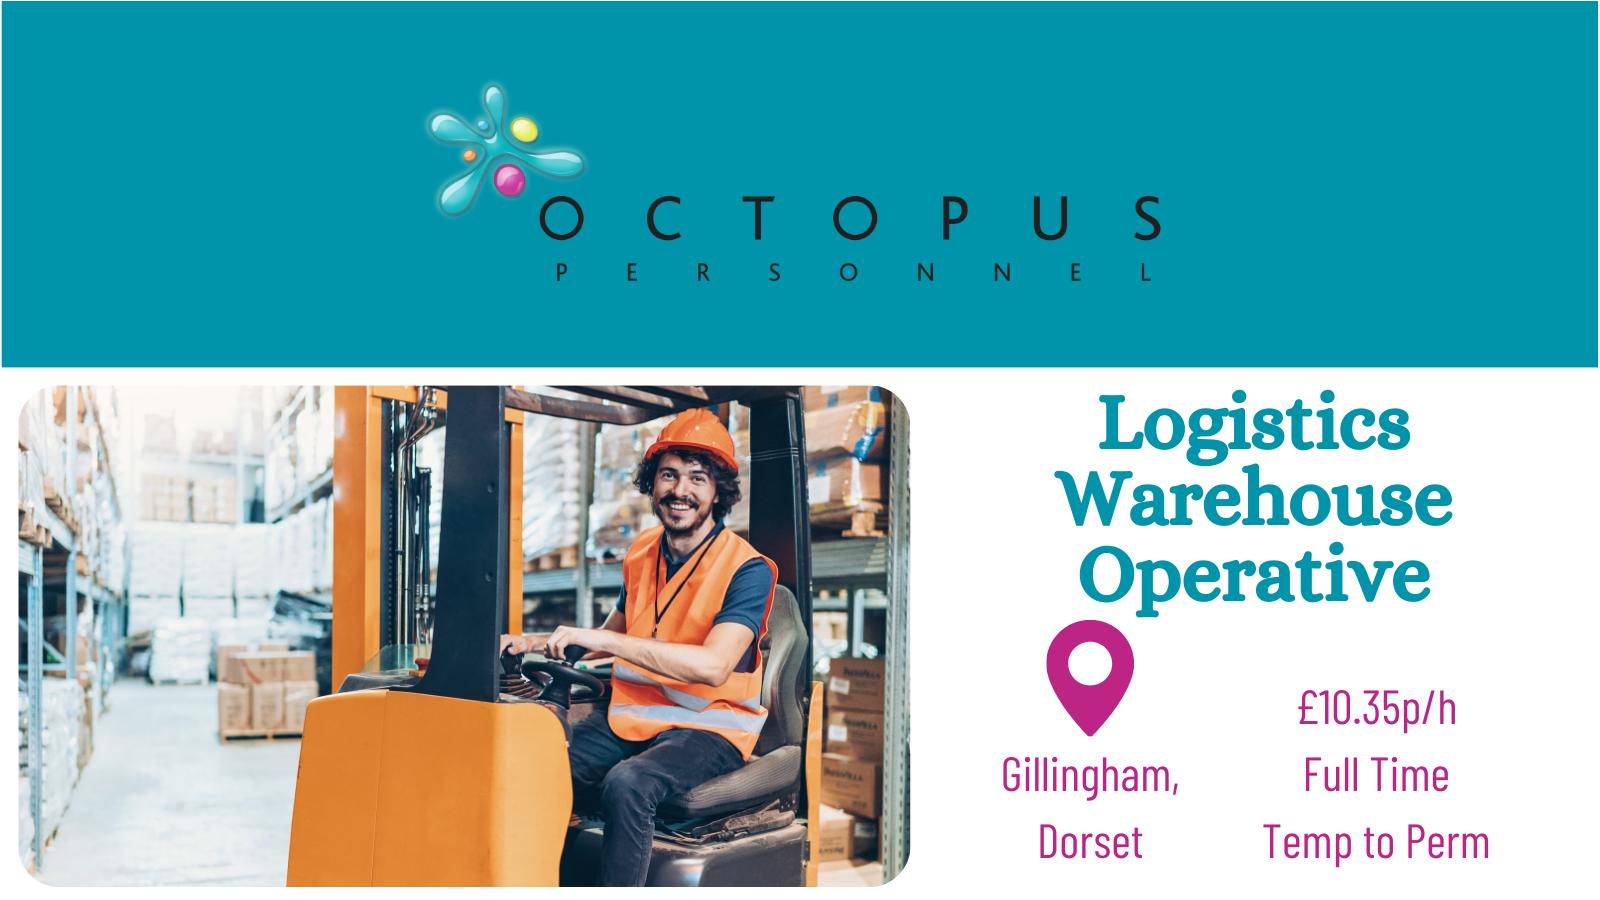 Logistics Warehouse Operative